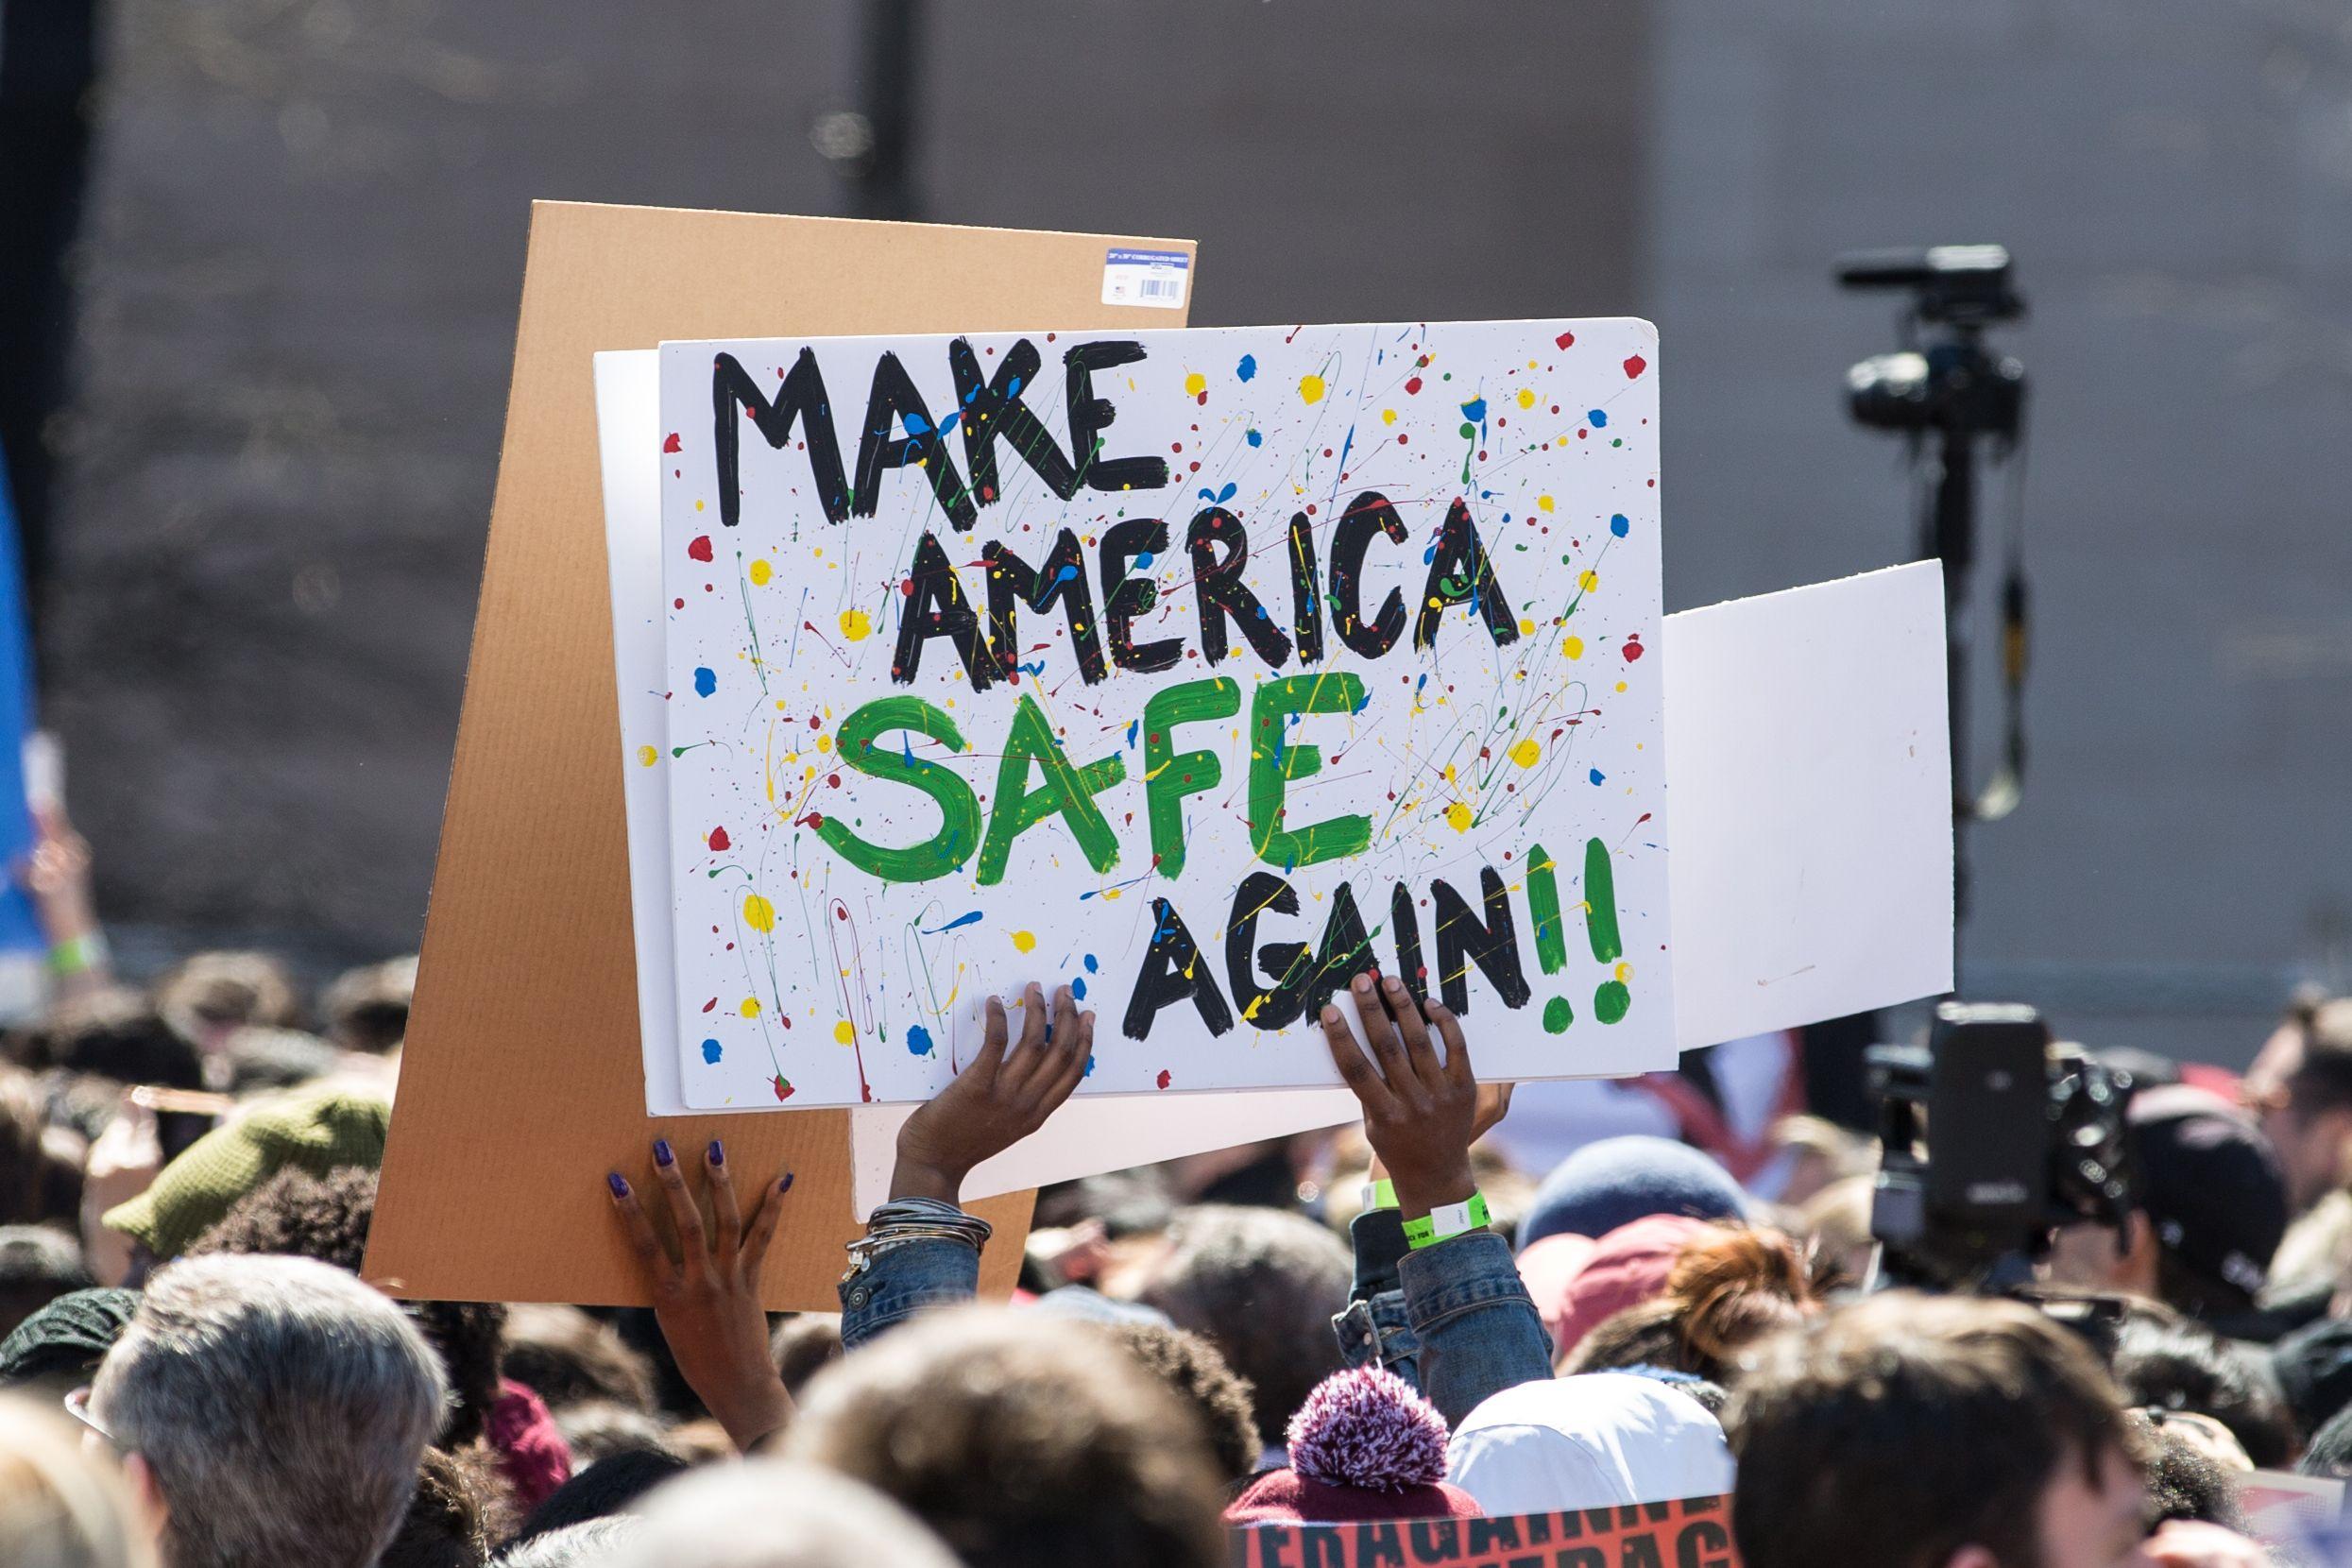 make america safe again poster